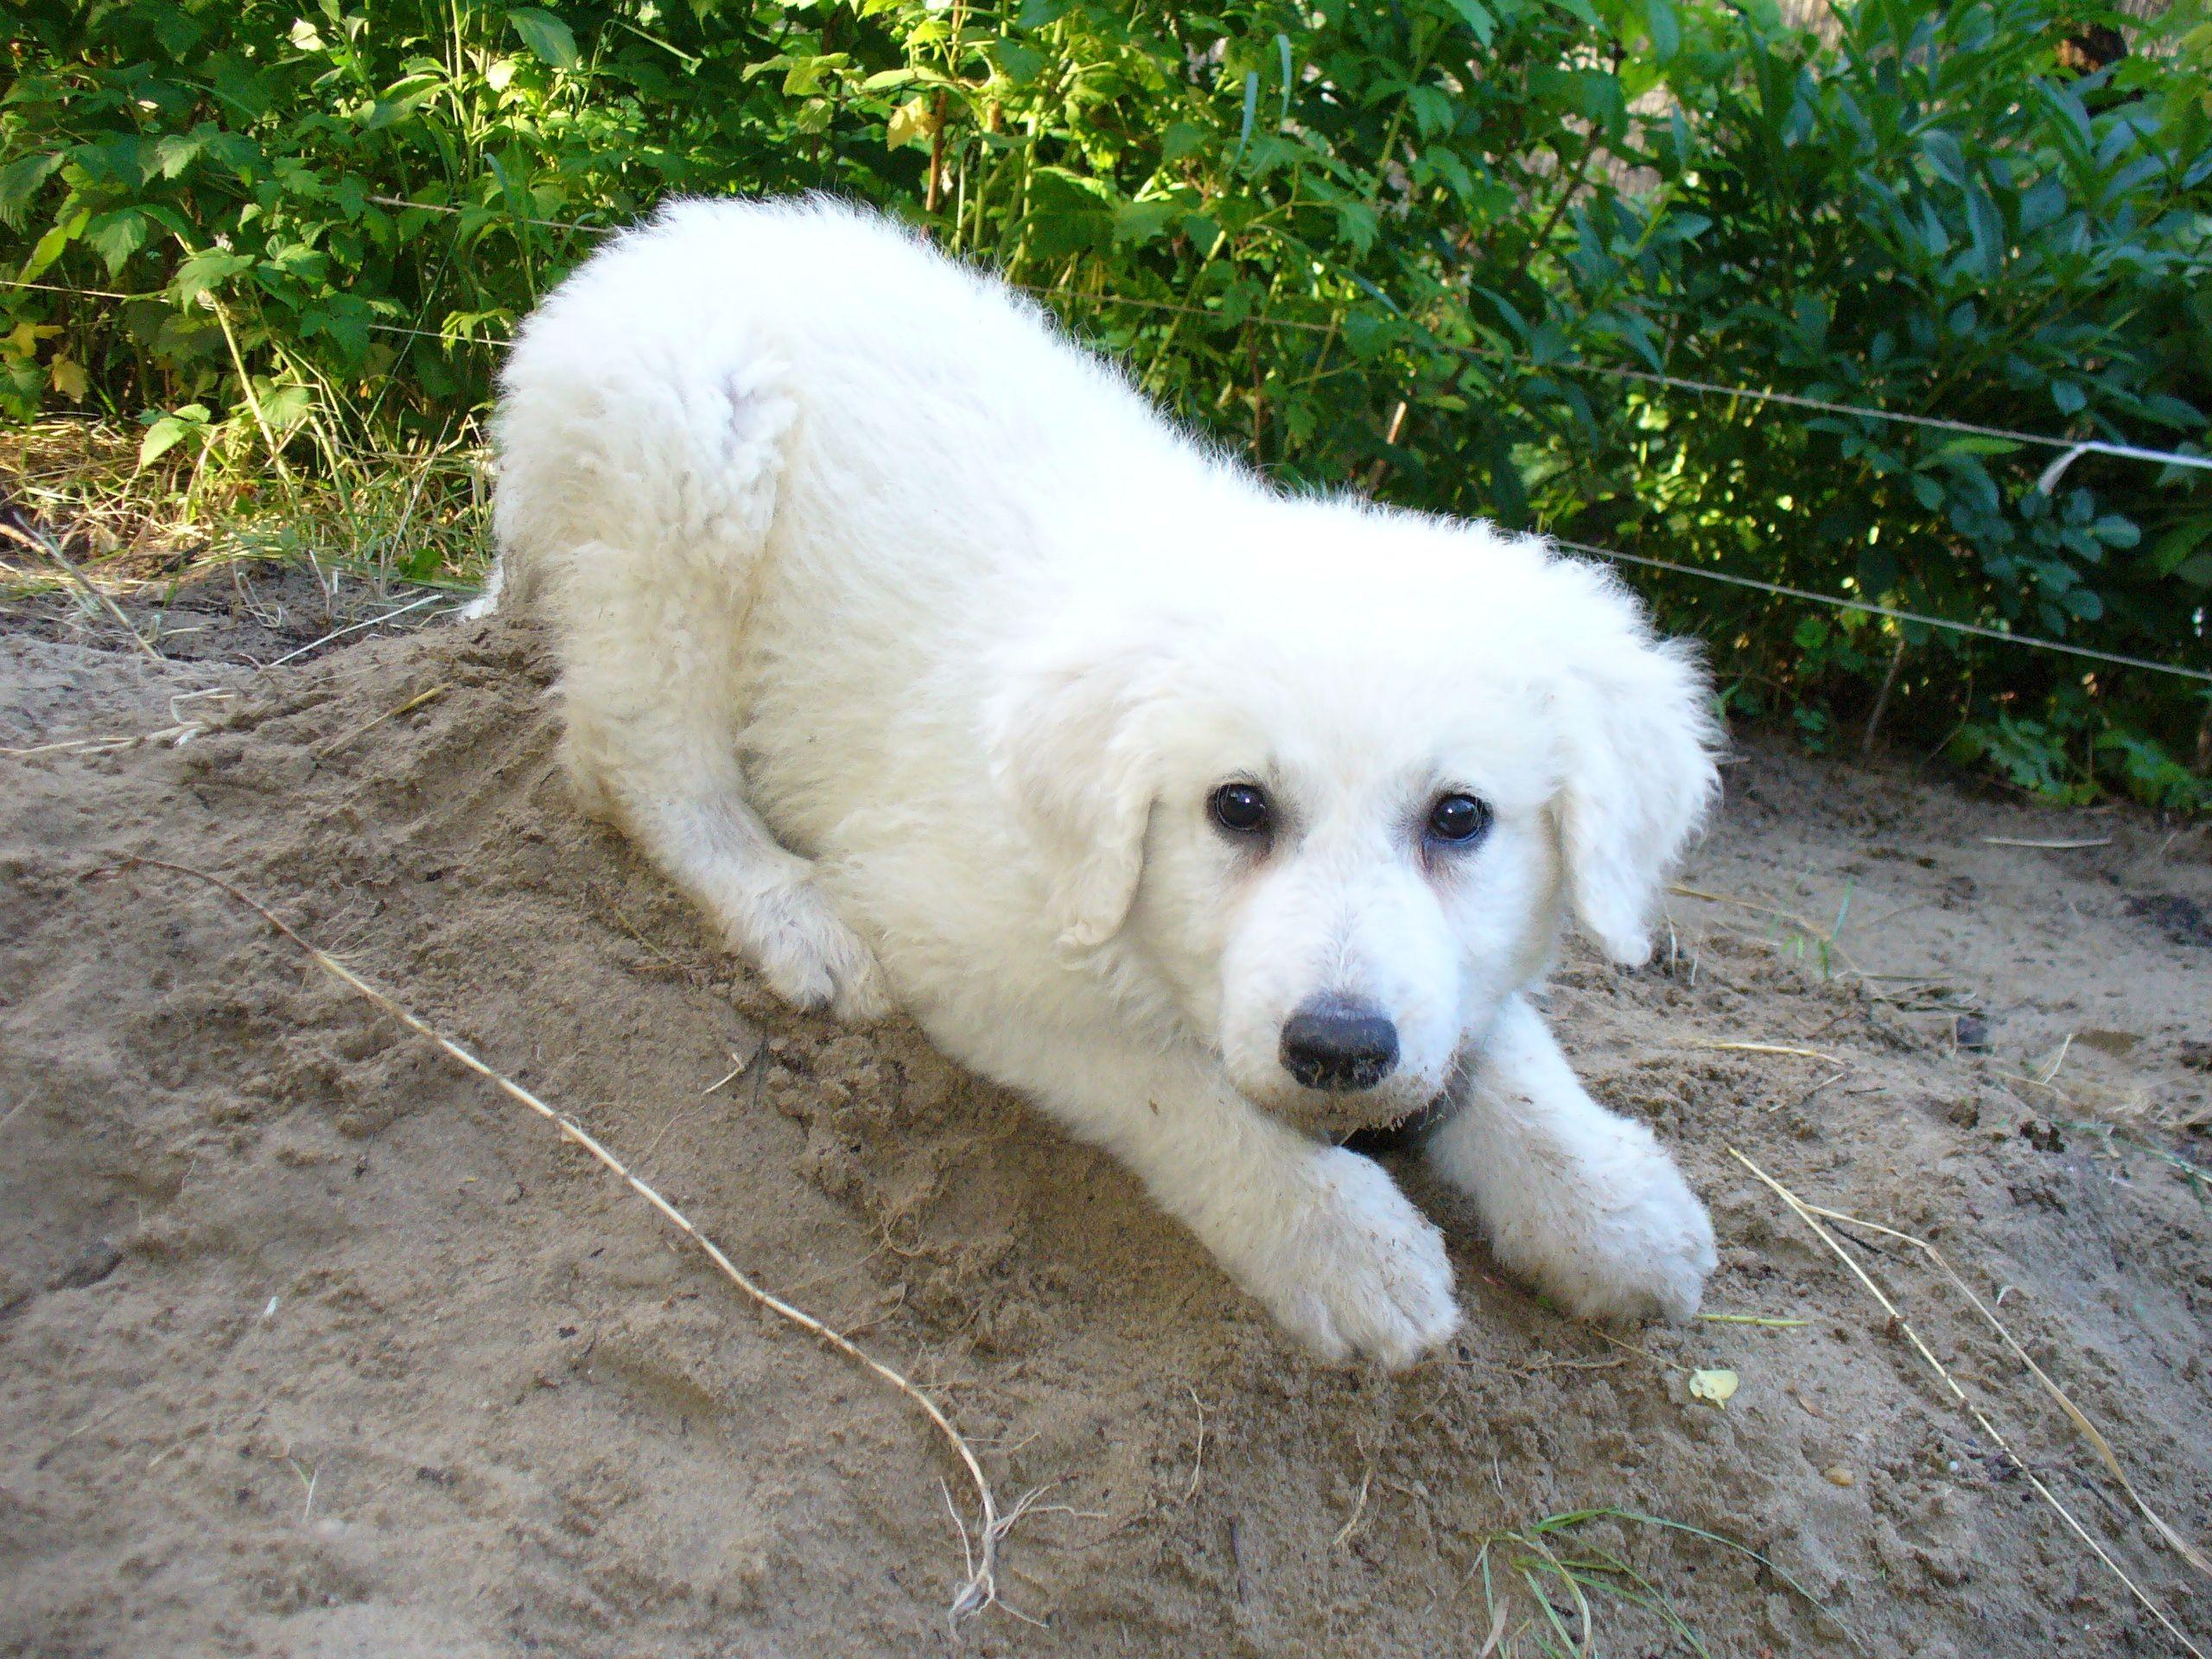 Cute Labrador Puppy Wallpaper Lovely Kuvasz Dog Photo And Wallpaper Beautiful Lovely